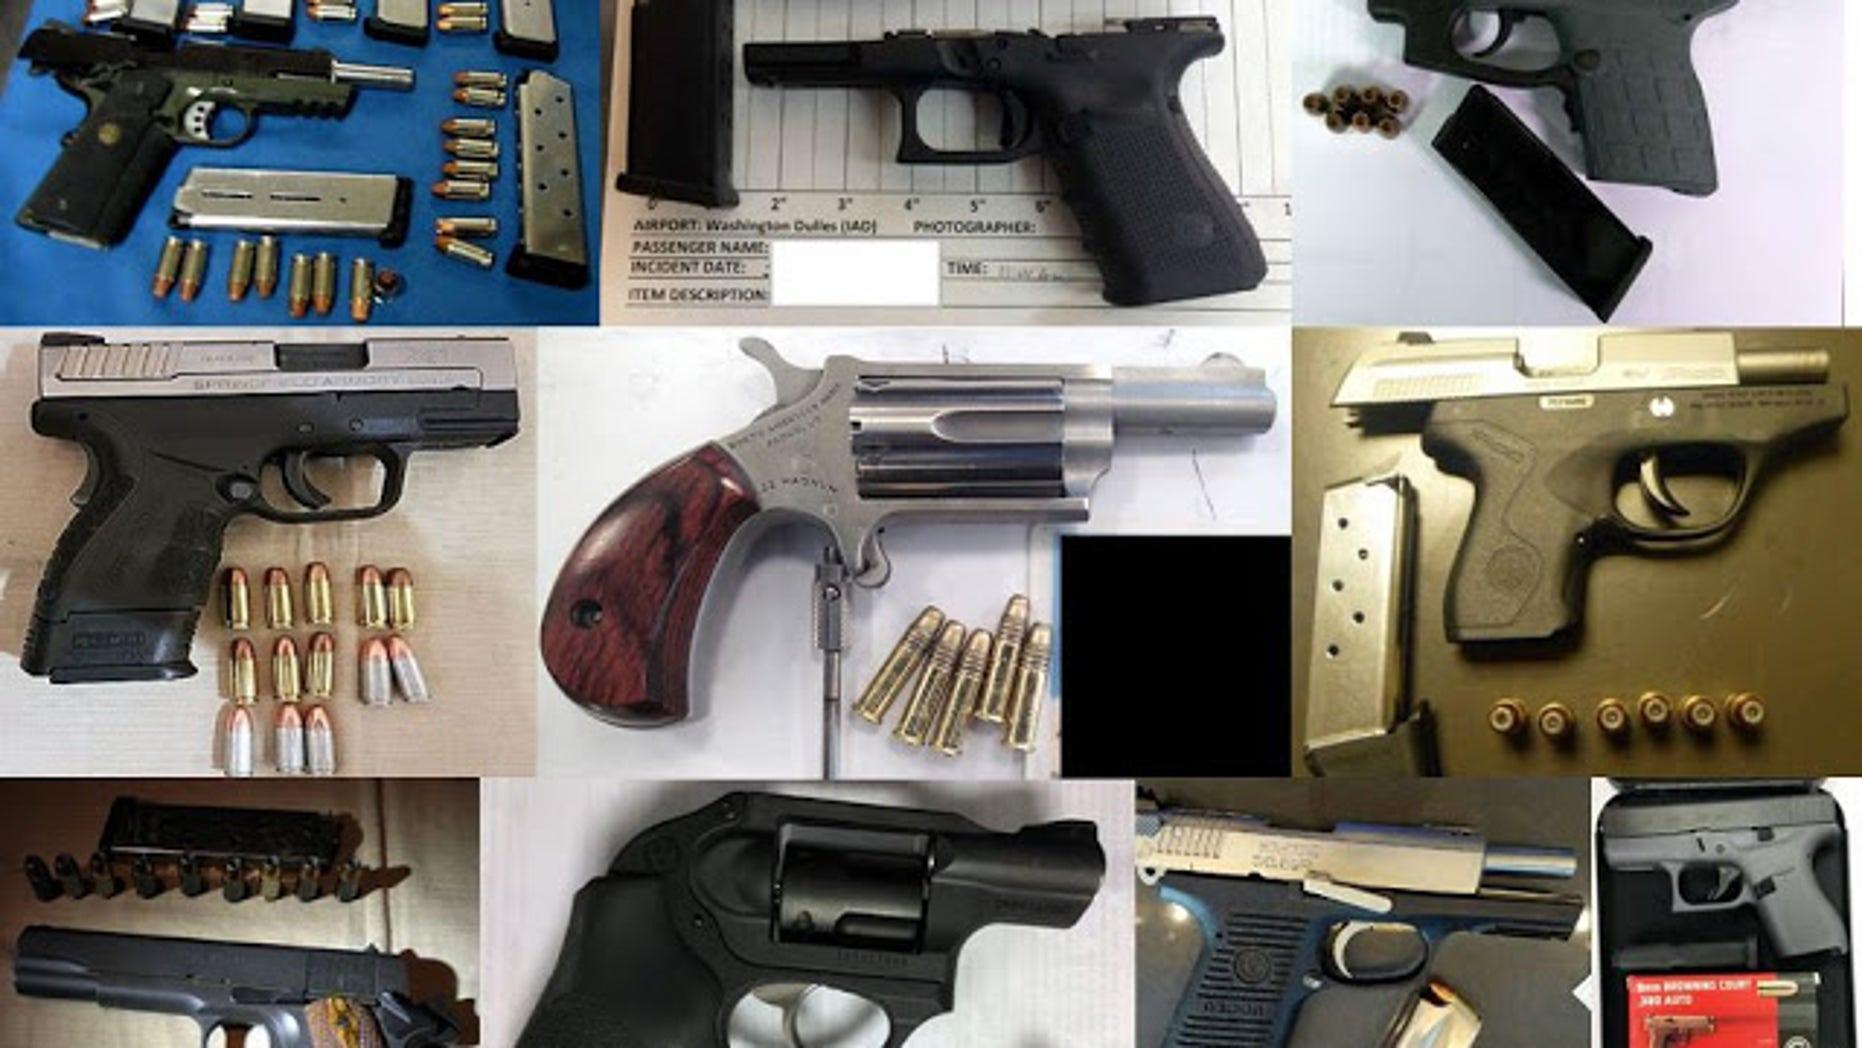 The TSA discovered 79 firearms last week.